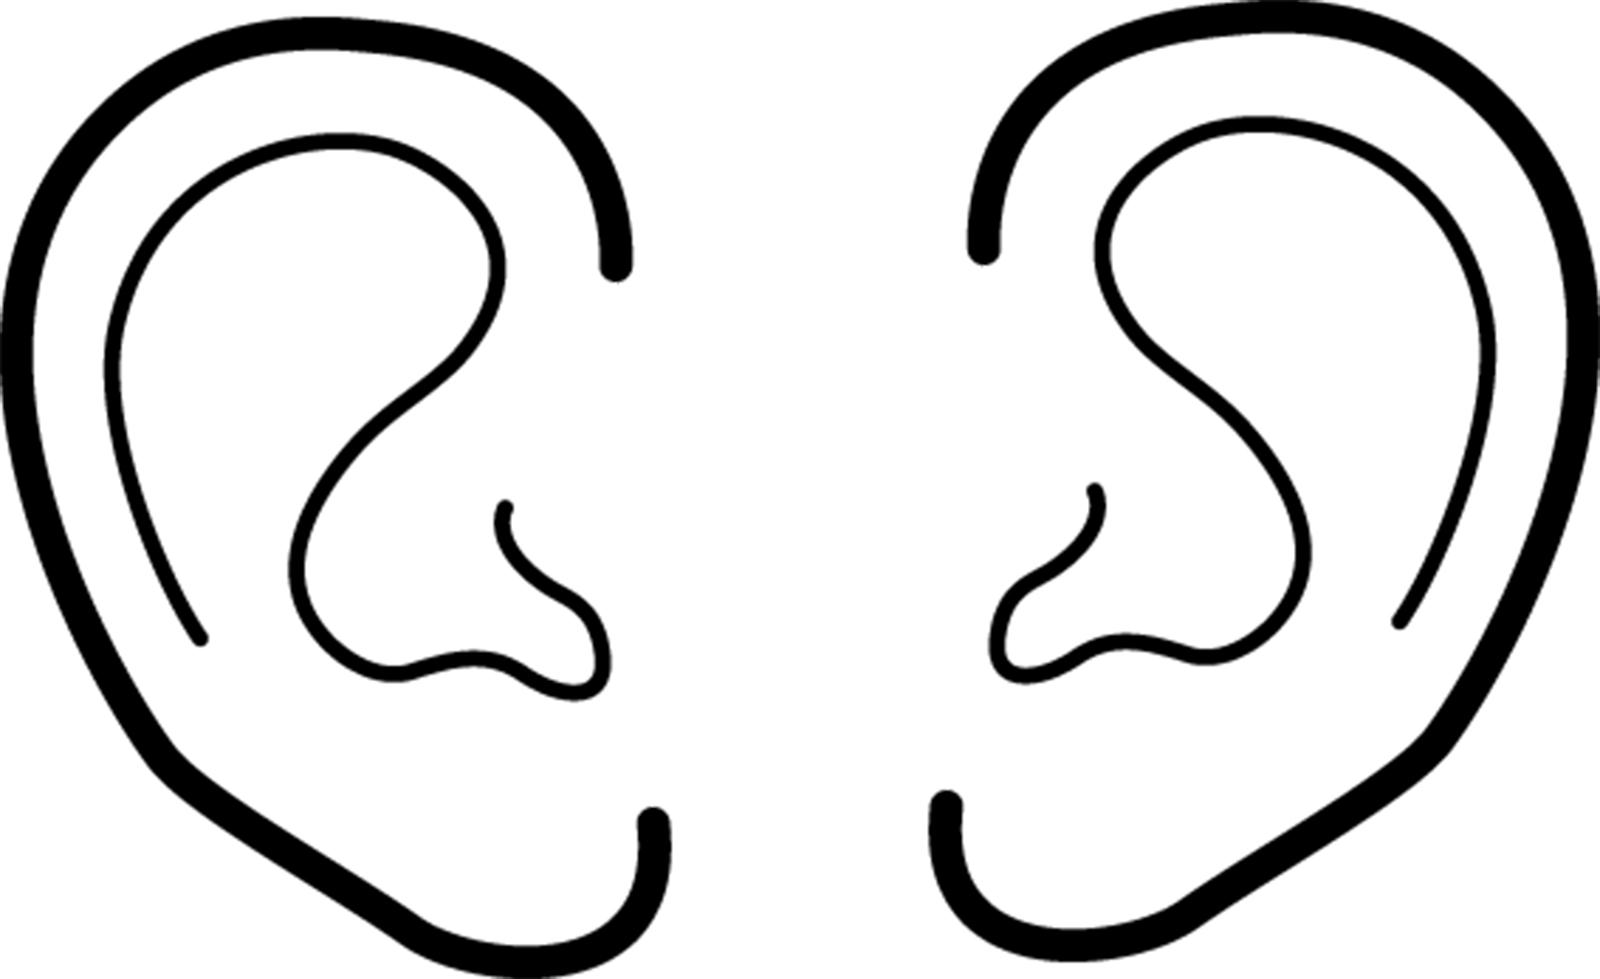 Ear Clipart Earclipart Images Listening -Ear clipart earclipart images listening clip art photo-11